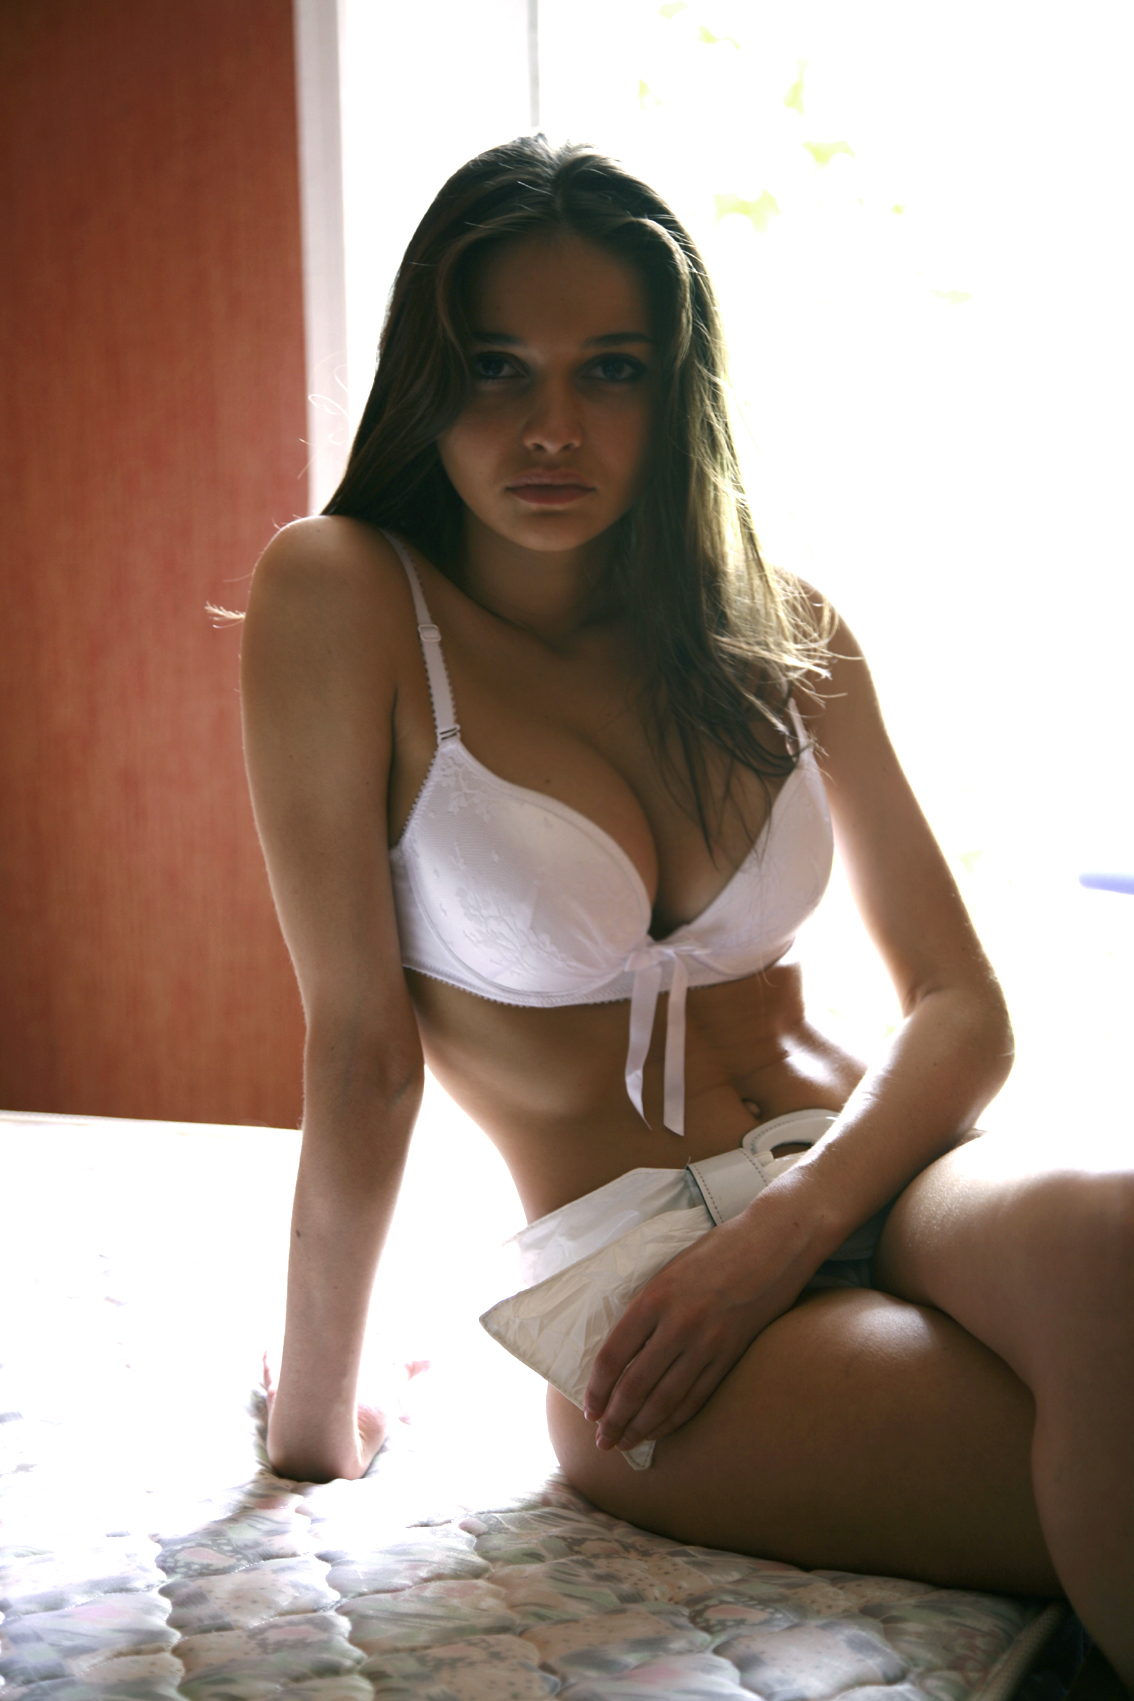 diana-skinny-nude-mike-dowson-01